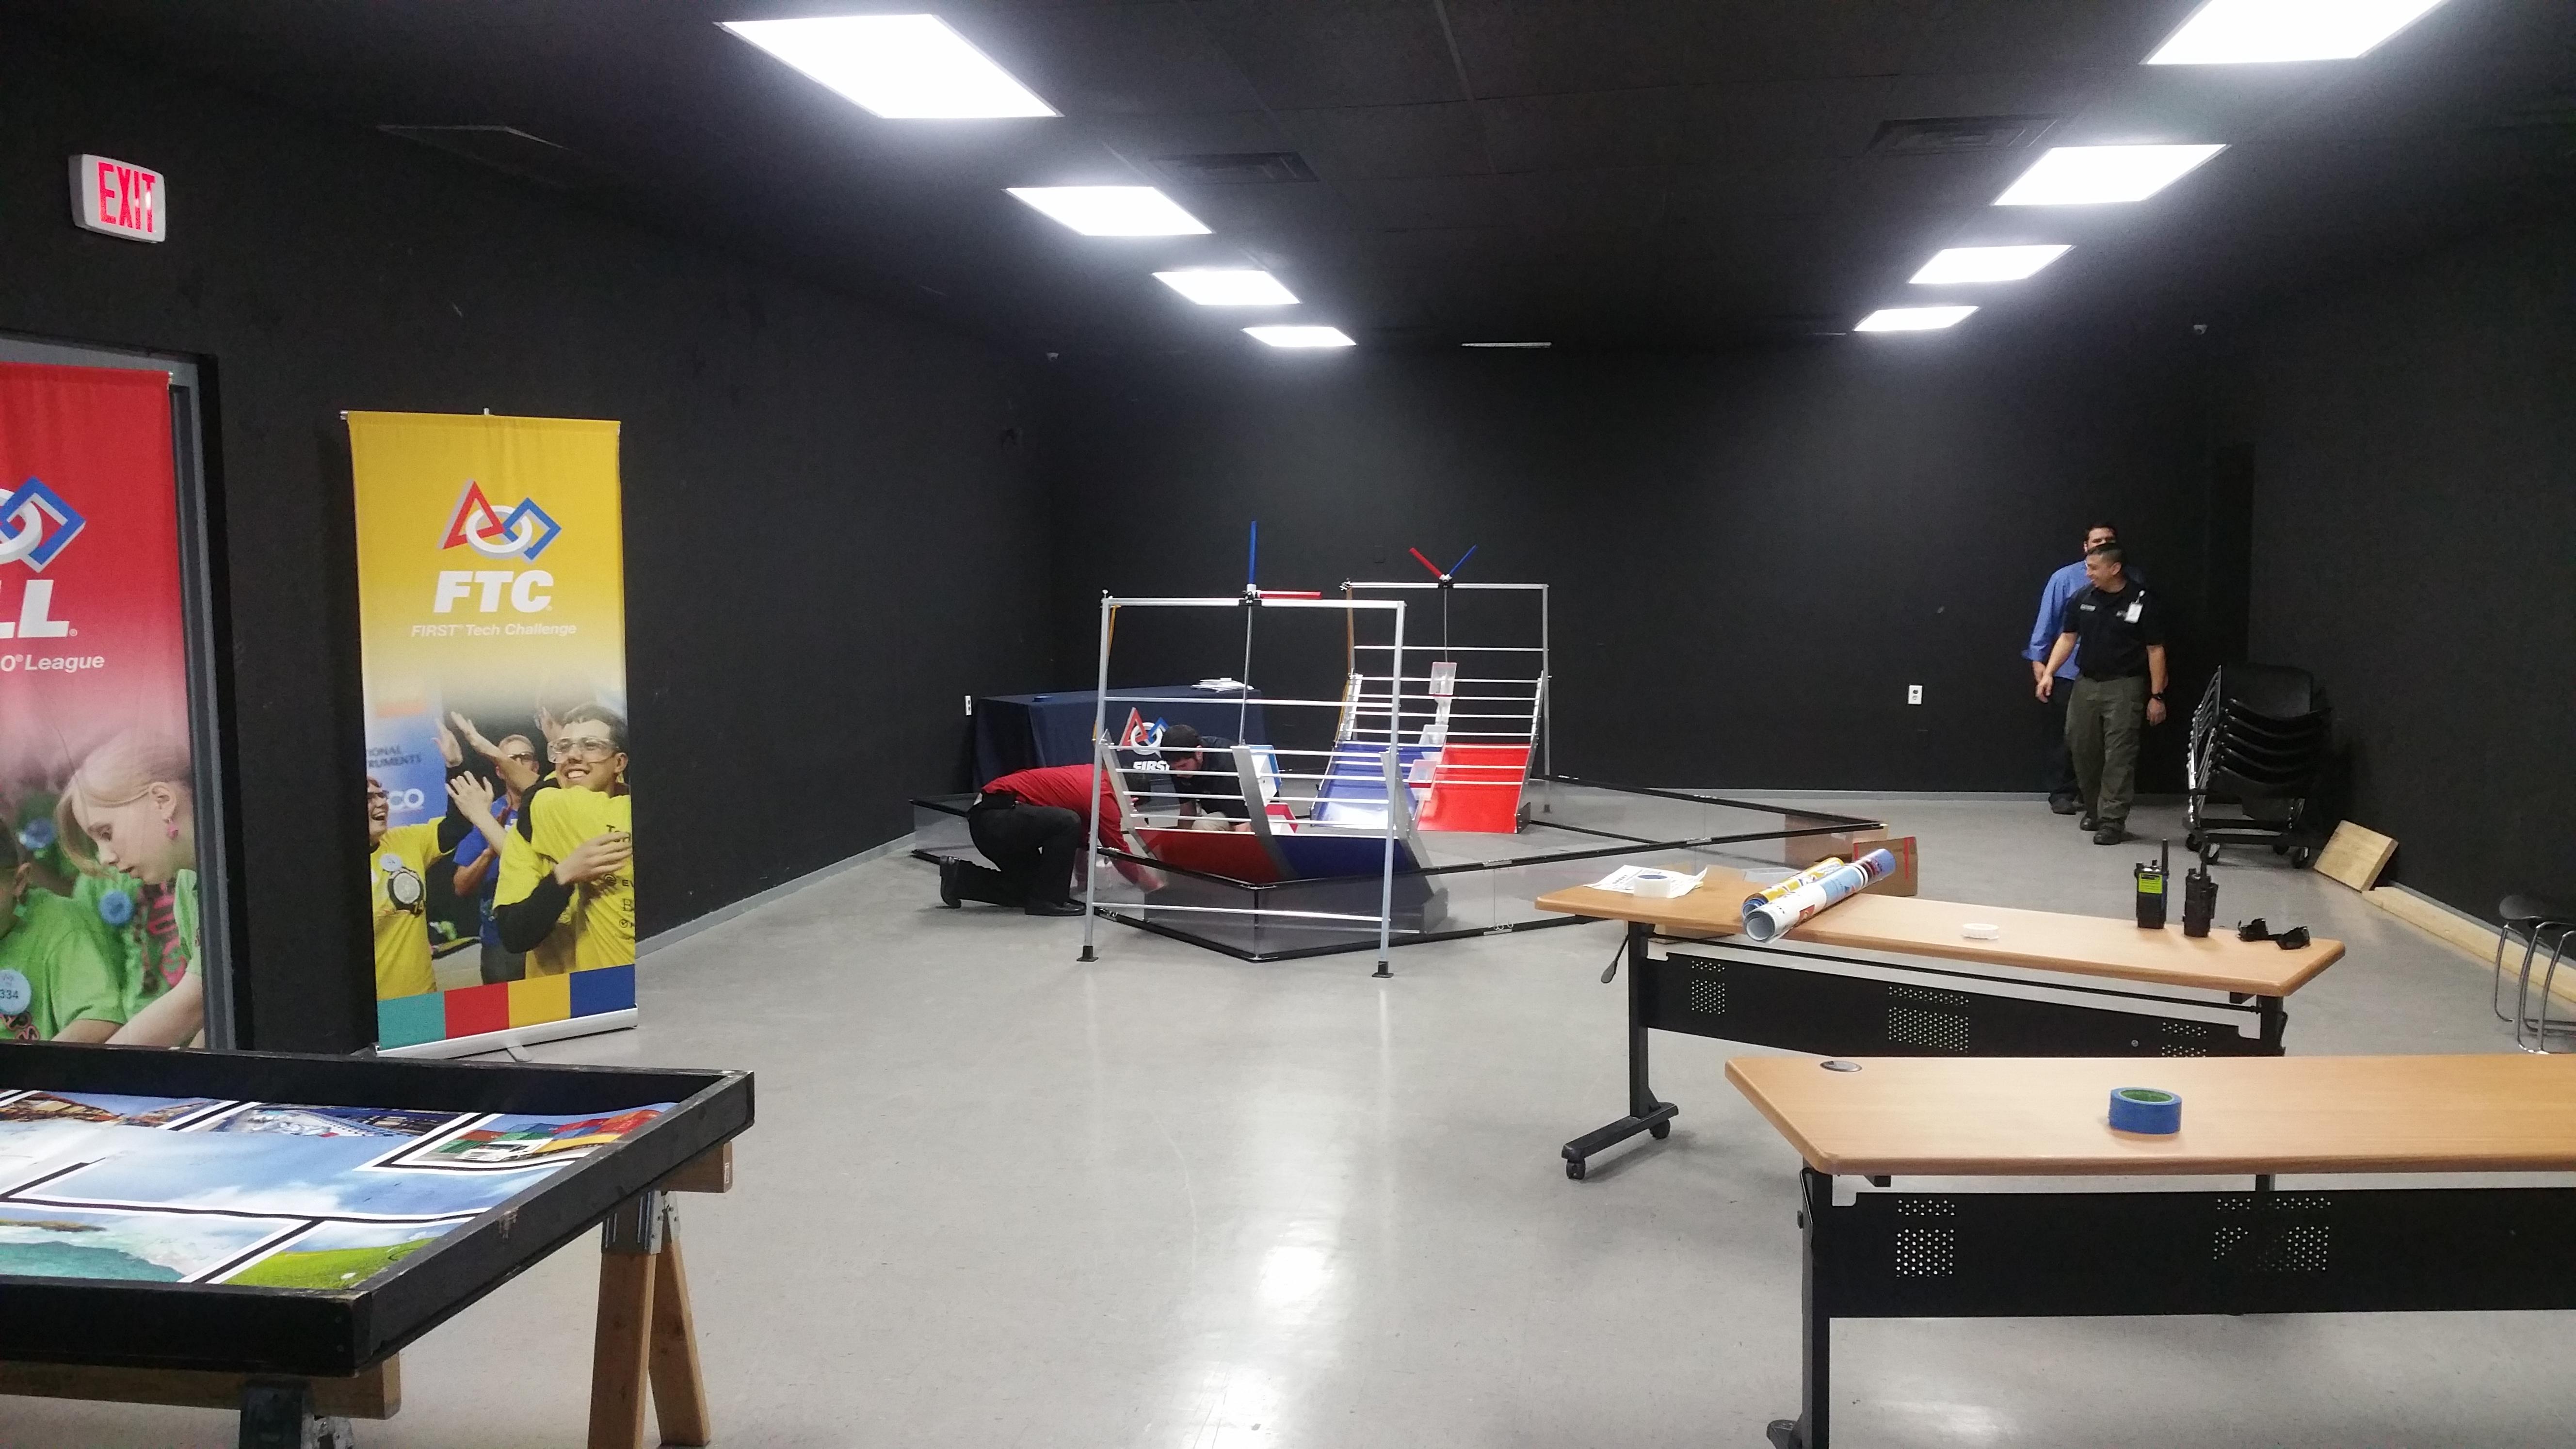 First Robotics Lab In Pharr